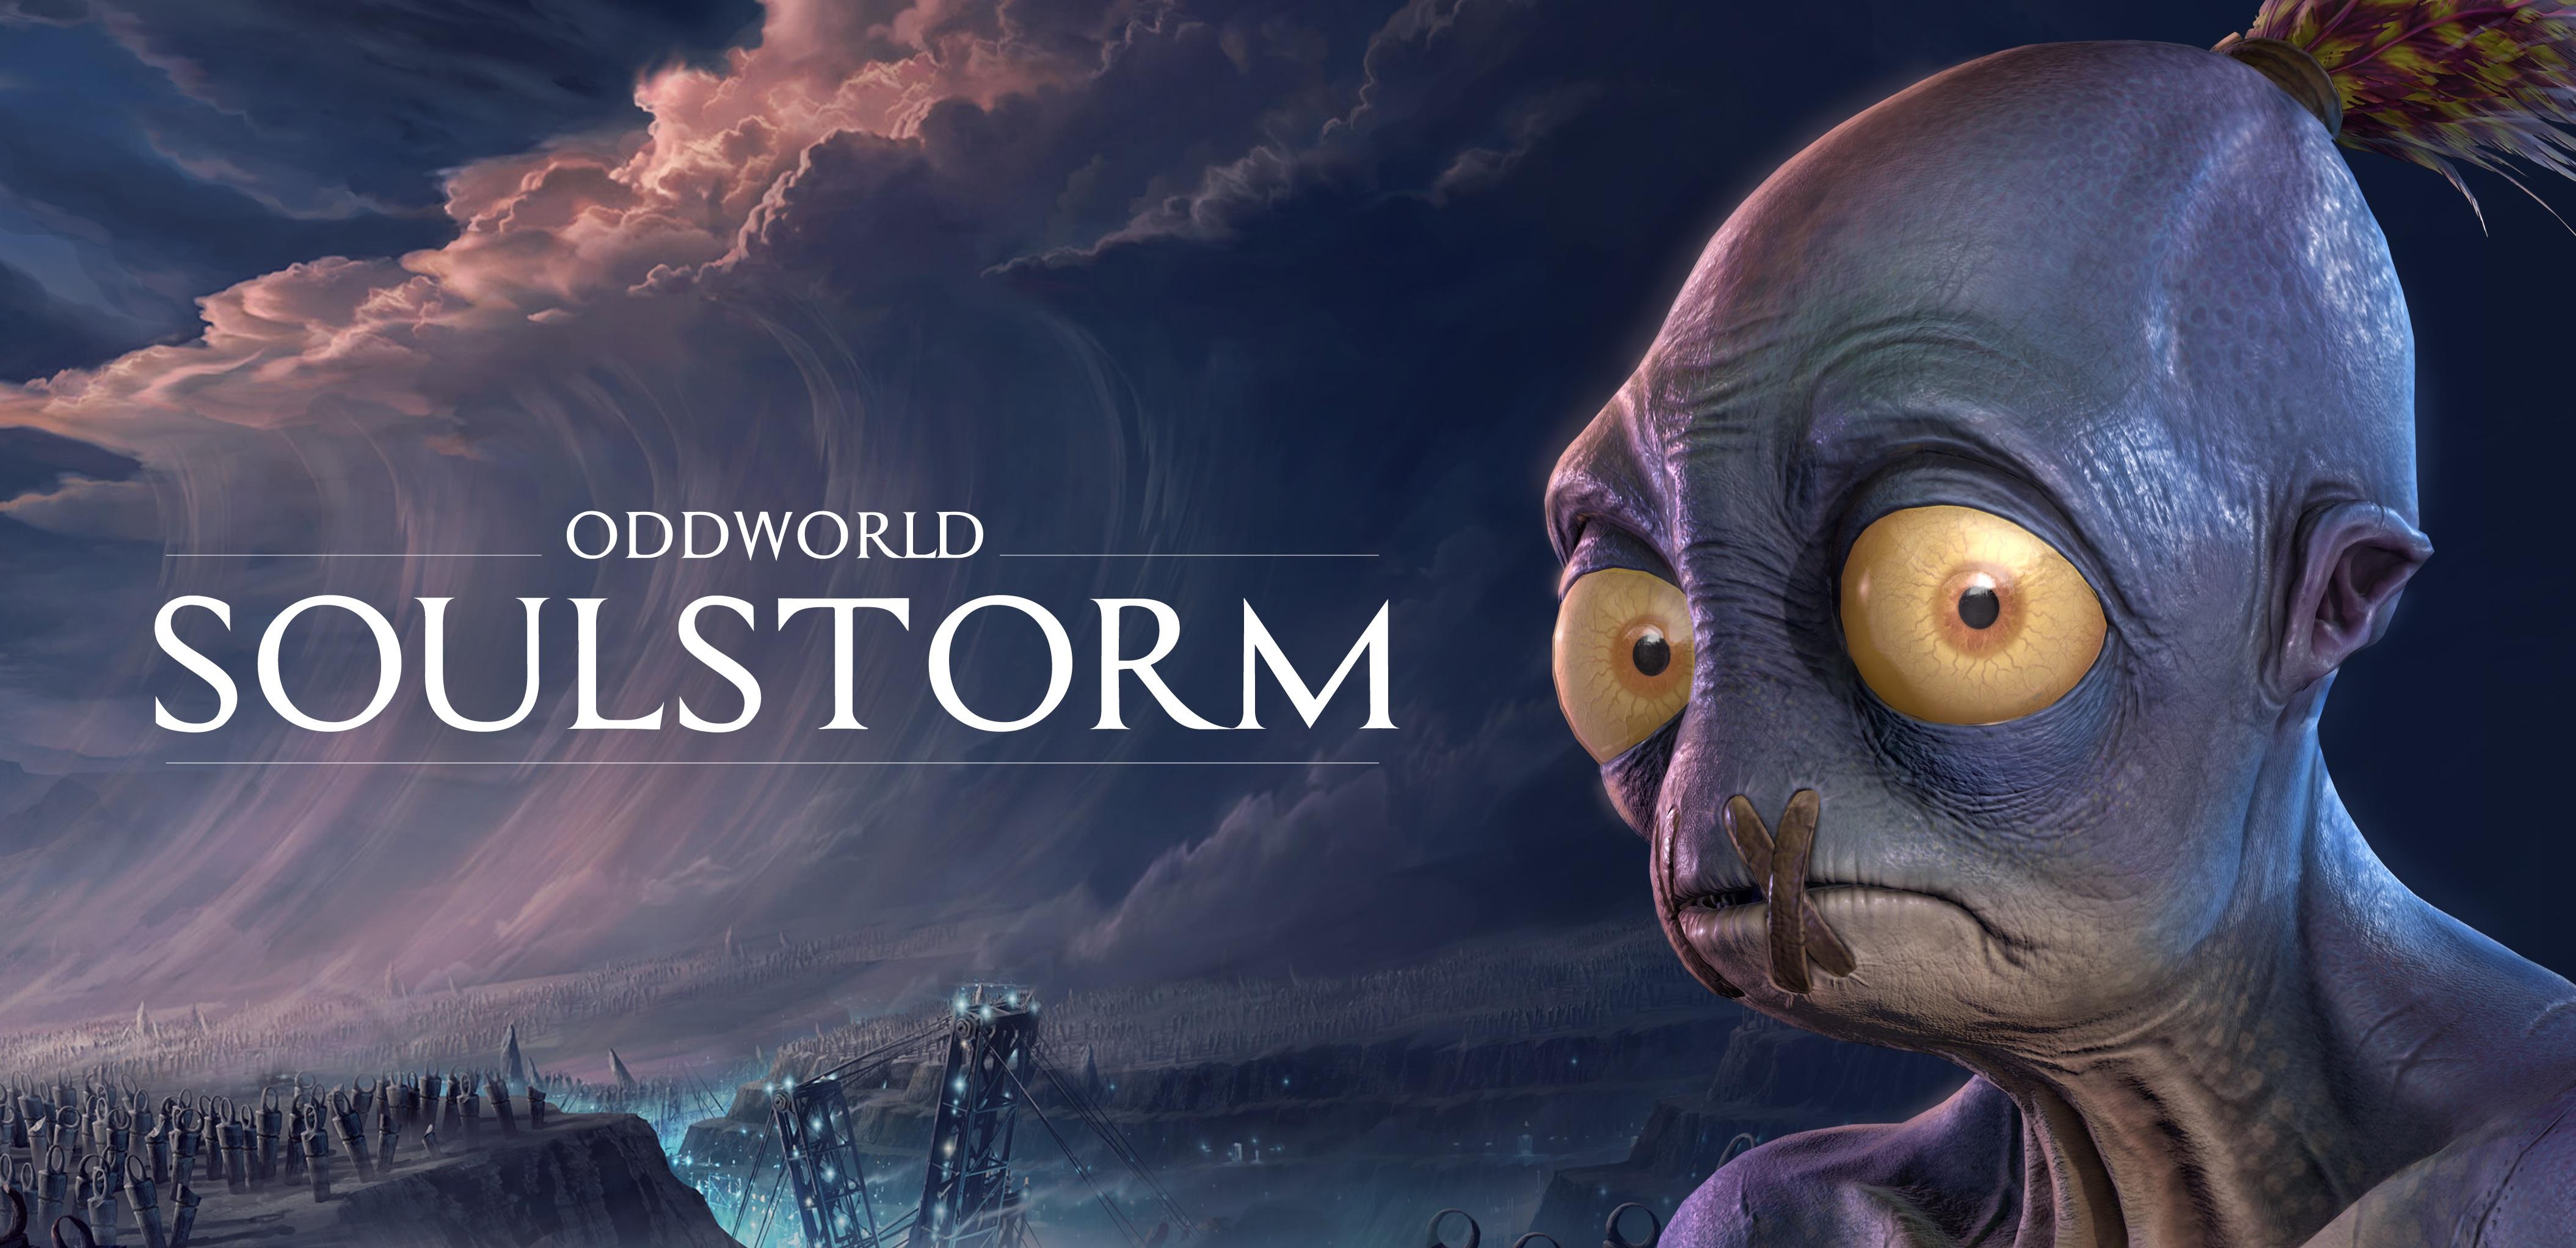 Oddworld: Soulstorm tile